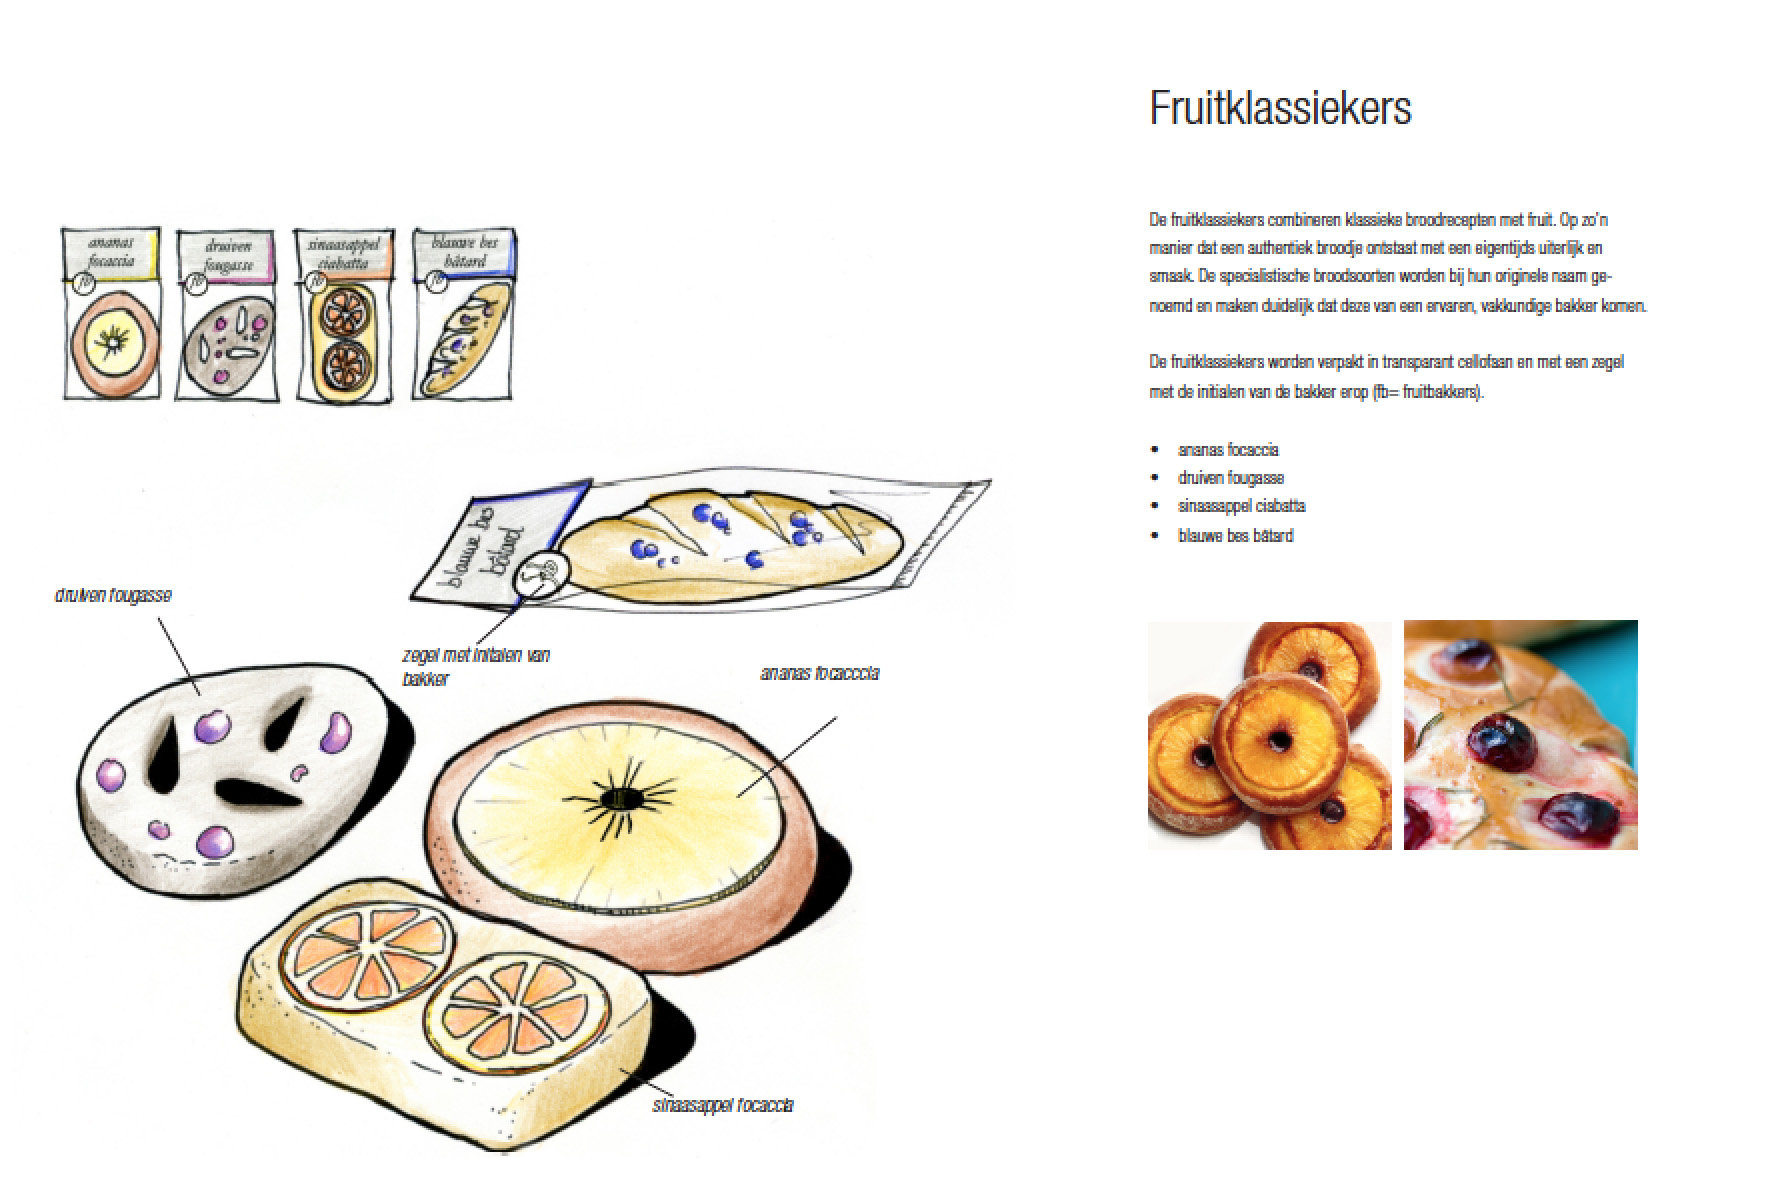 food-design-fruitbrood-klassiekers-fruitbakkers